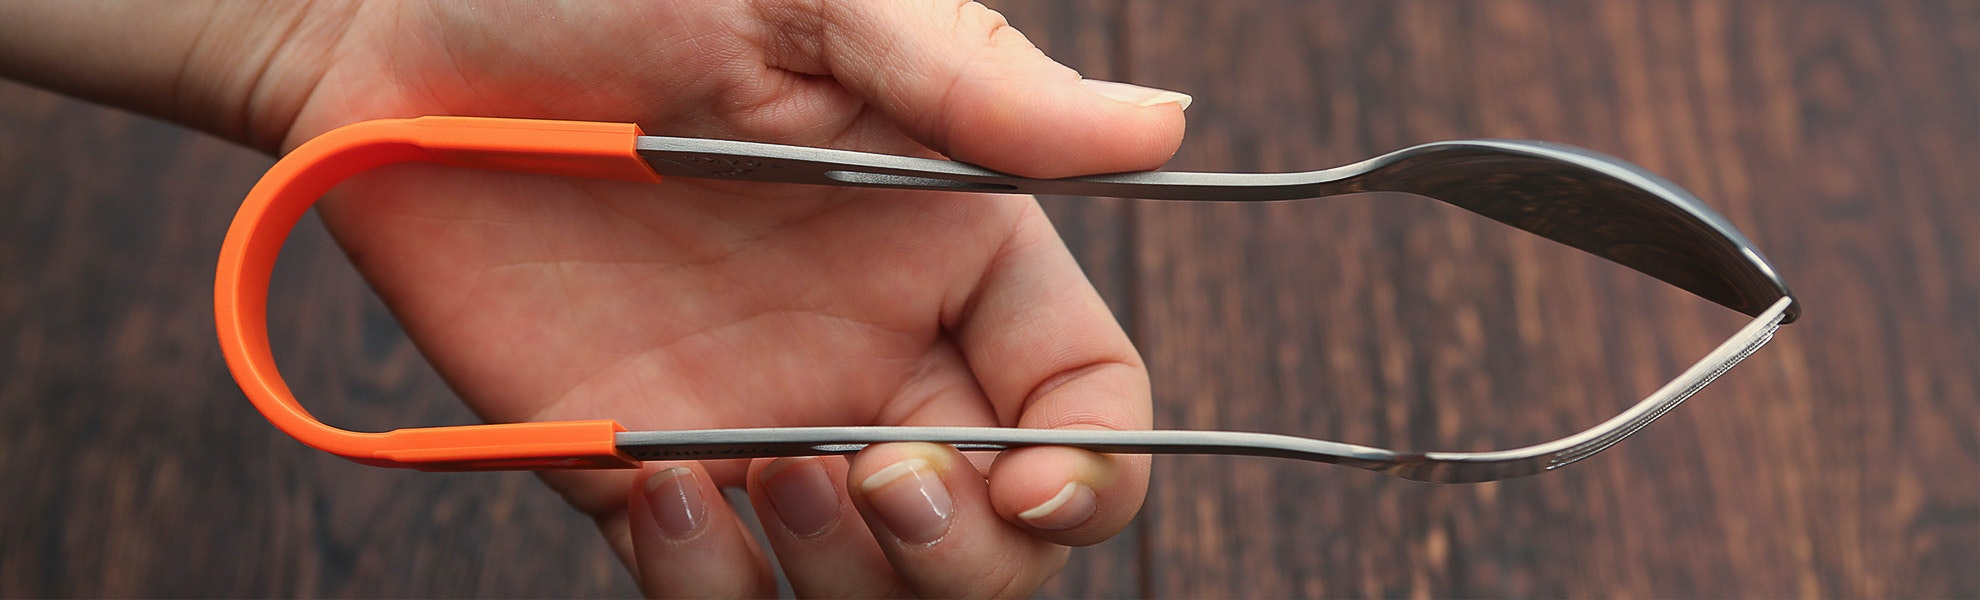 Toaks Fork Spoon Set (2-Pack)